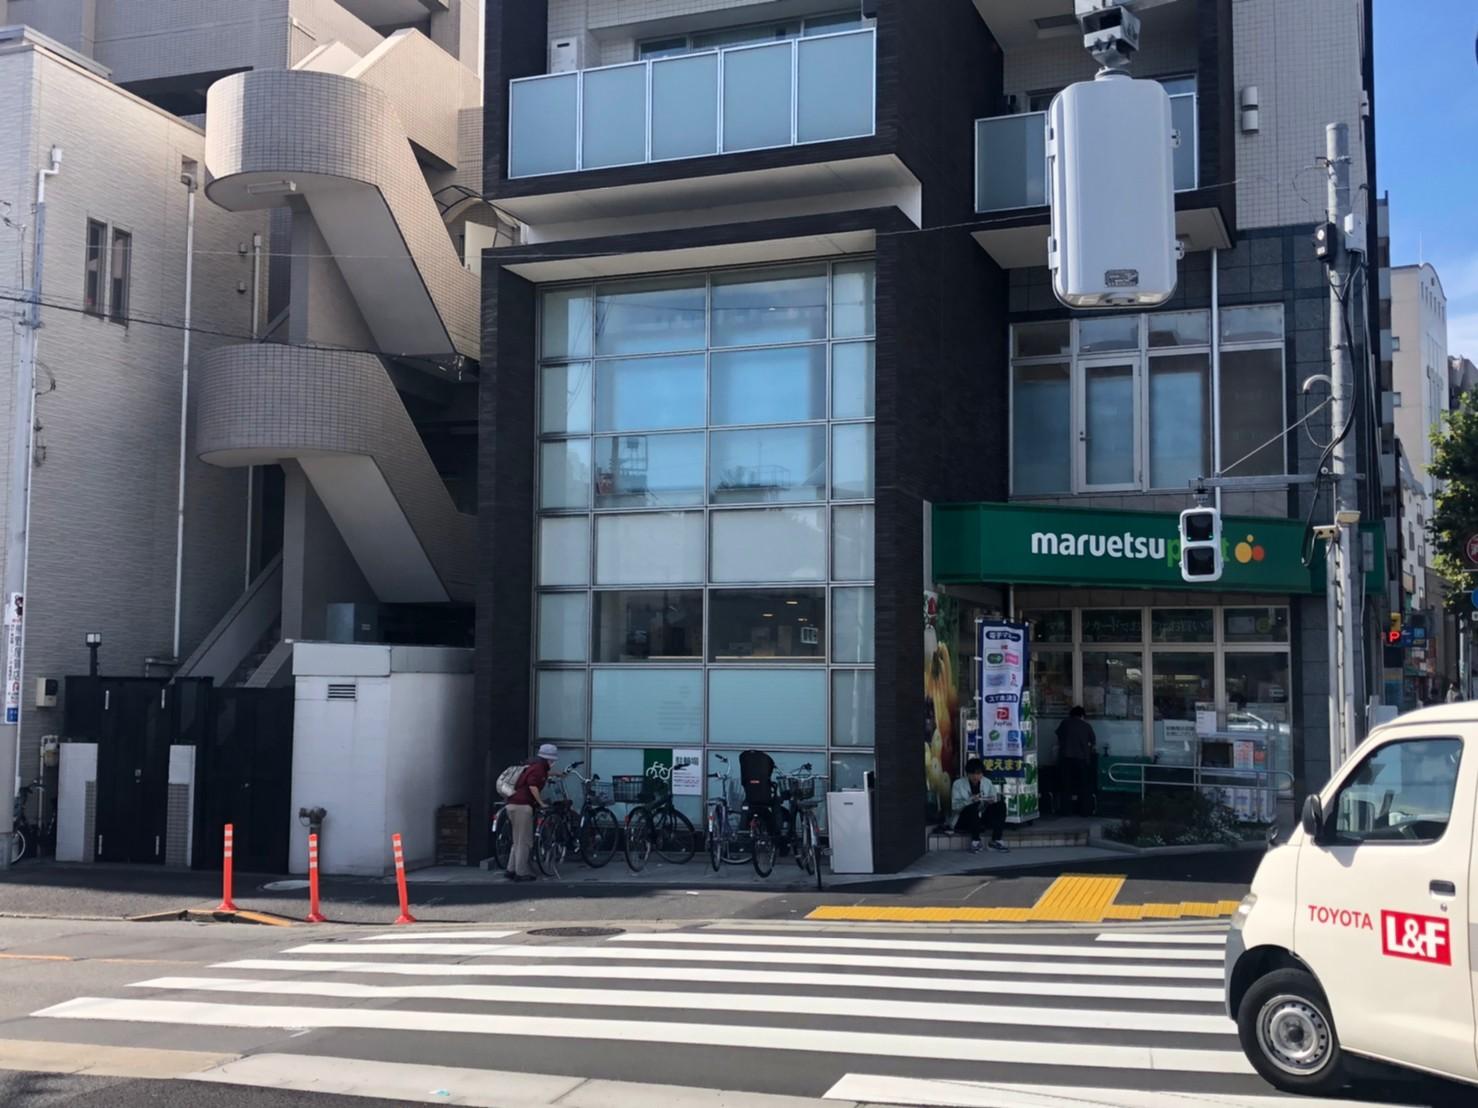 西武新宿線下落合駅近く、新宿駅まで一本◇Belle Ville 下落合◇